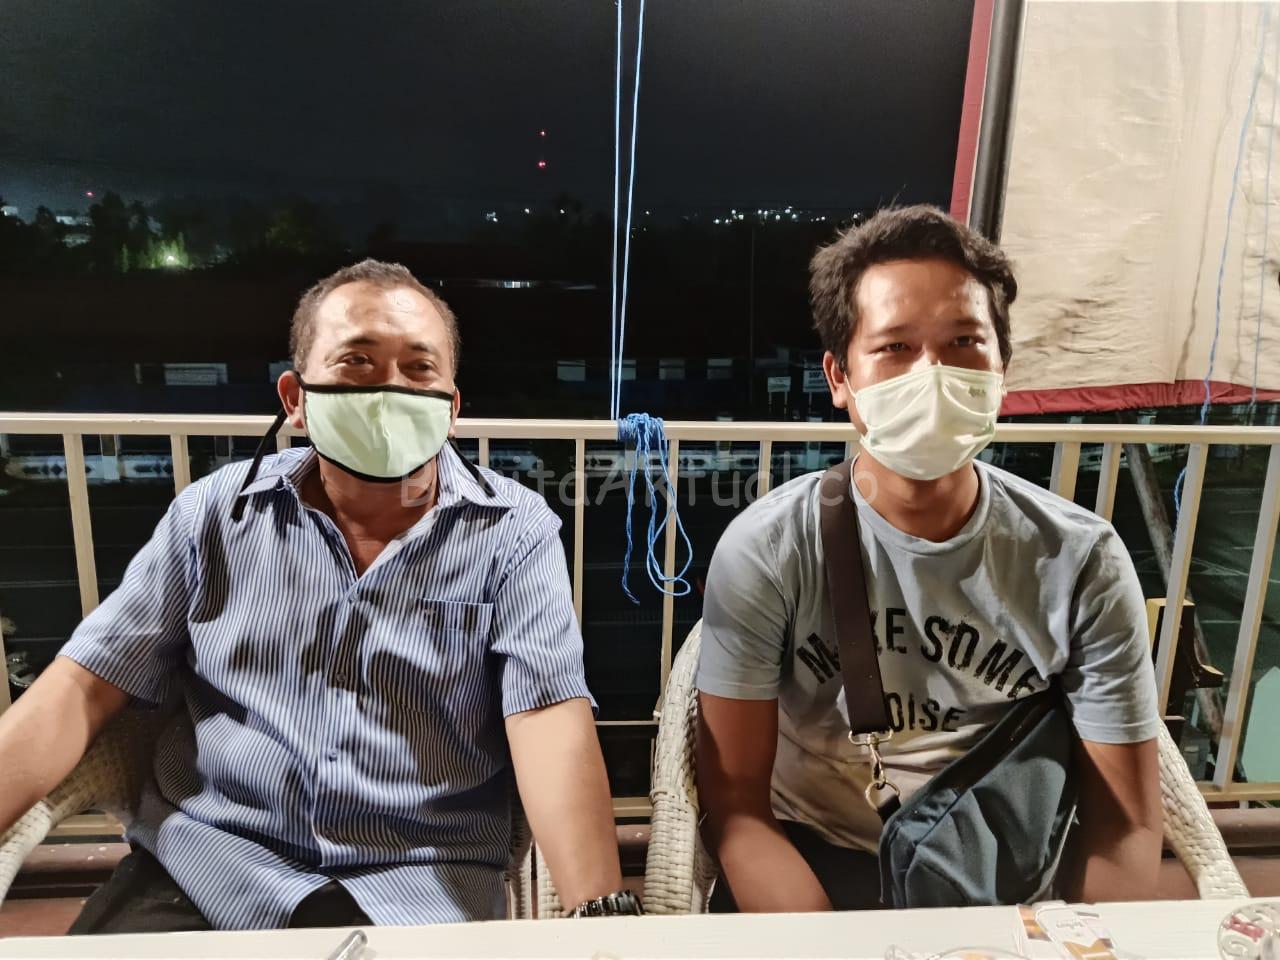 Polres Manokwari Bersama Polda PB Berhasil Tangkap 10 Pelaku Begal Yang Berusia Dibawah Umur 5 IMG 20200506 WA0029